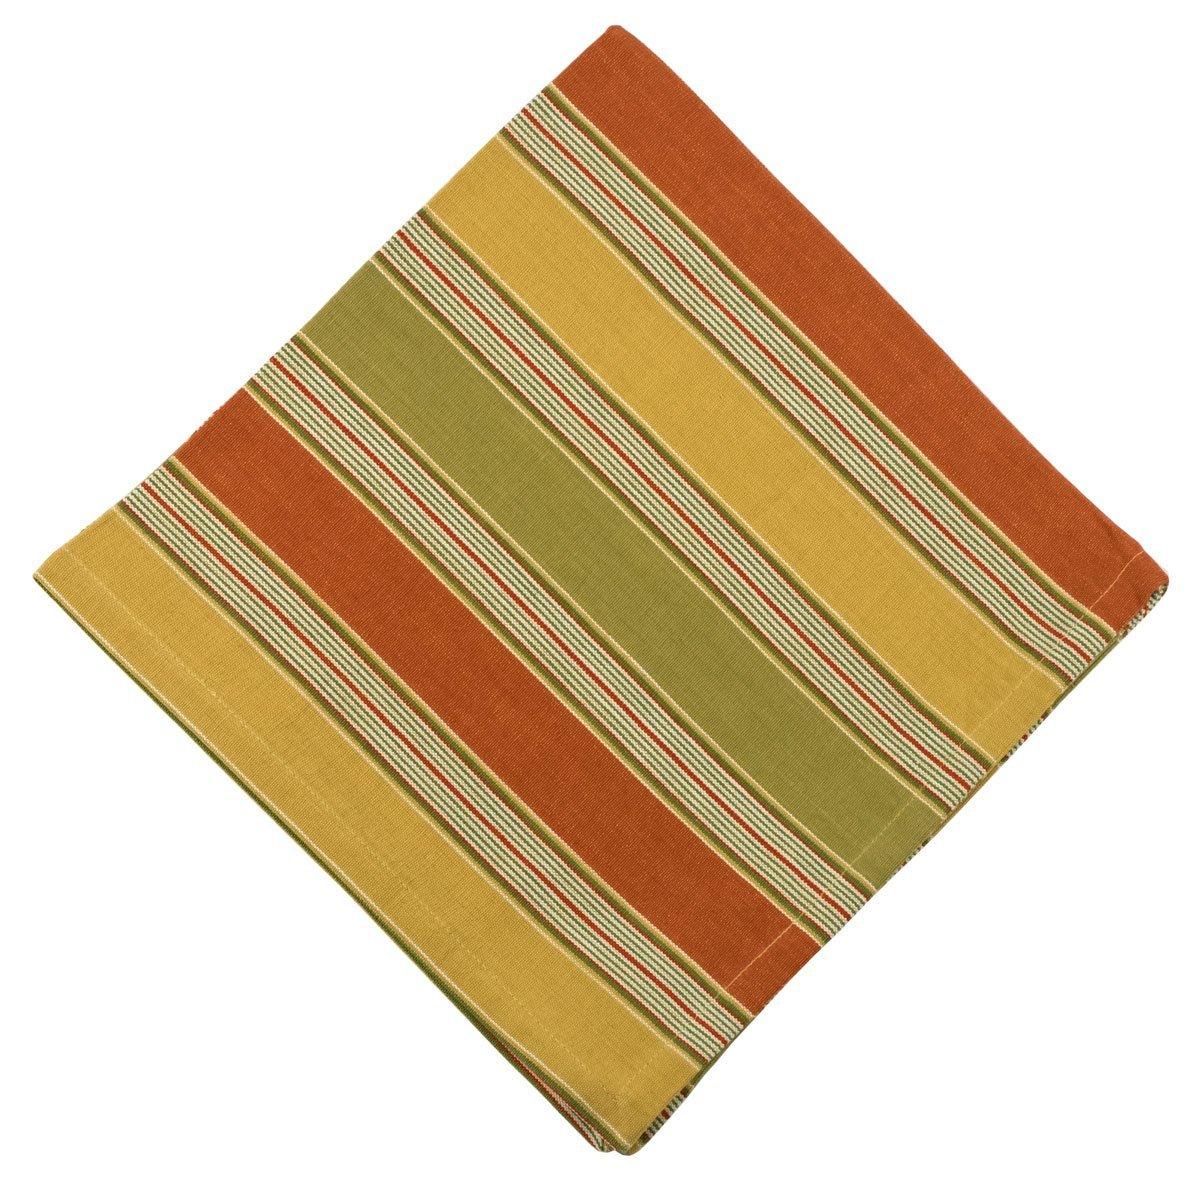 100% Cotton Yellow Rust & Green Stripe 60cm x 60cm Napkins, Set of 6 - Equinox 6 Equinox B011VE130E